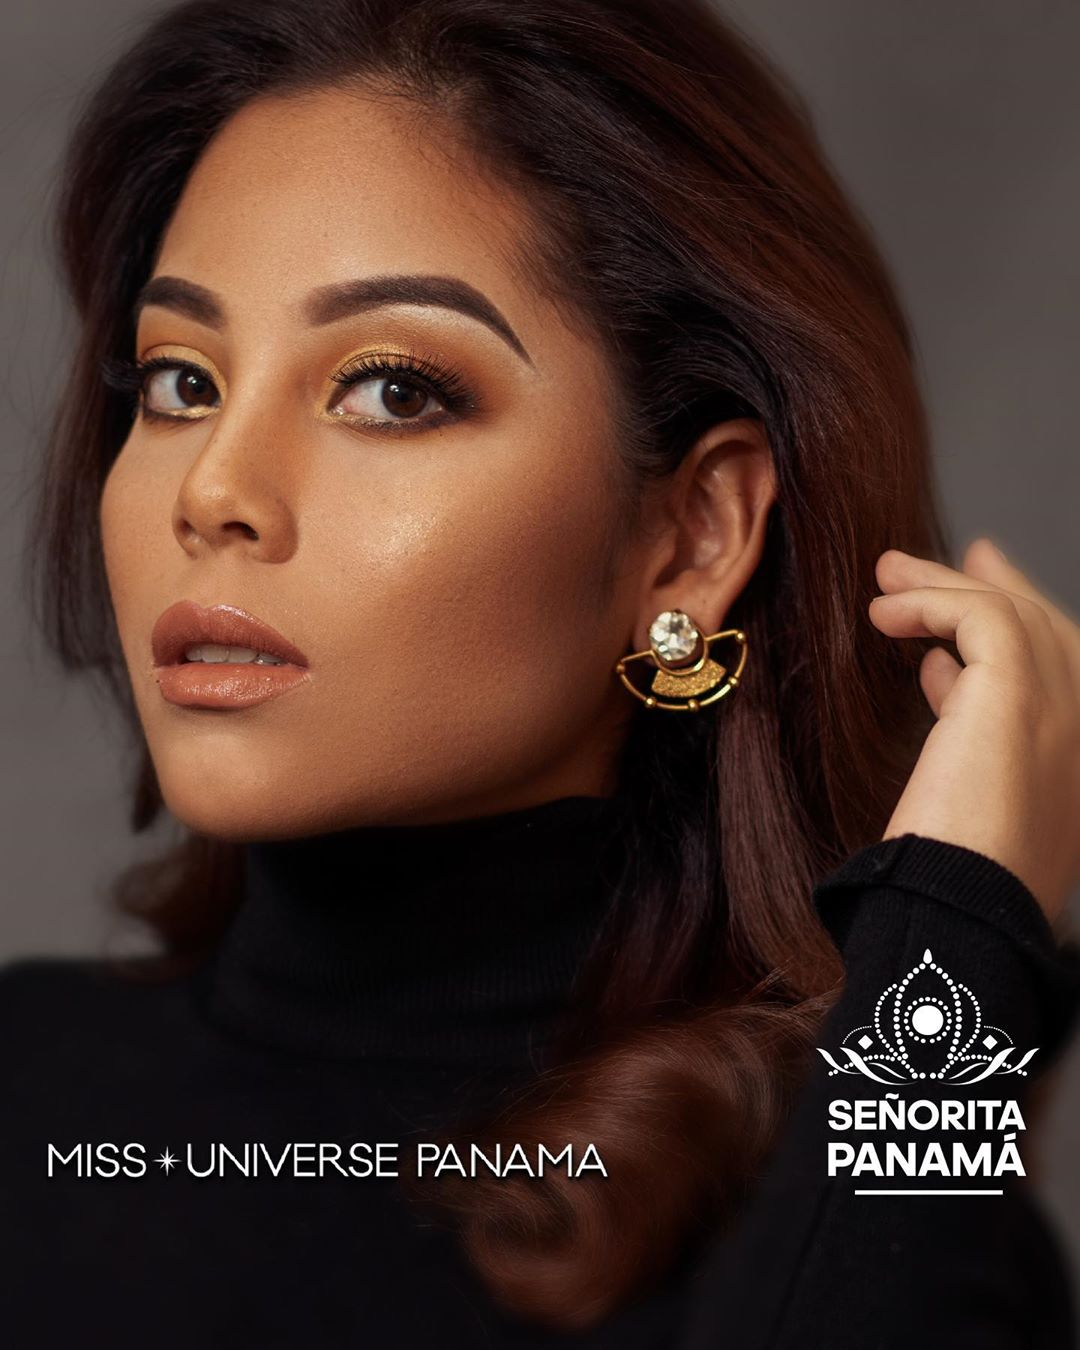 candidatas a senorita panama 2020. final: 16 may. IiGyoP